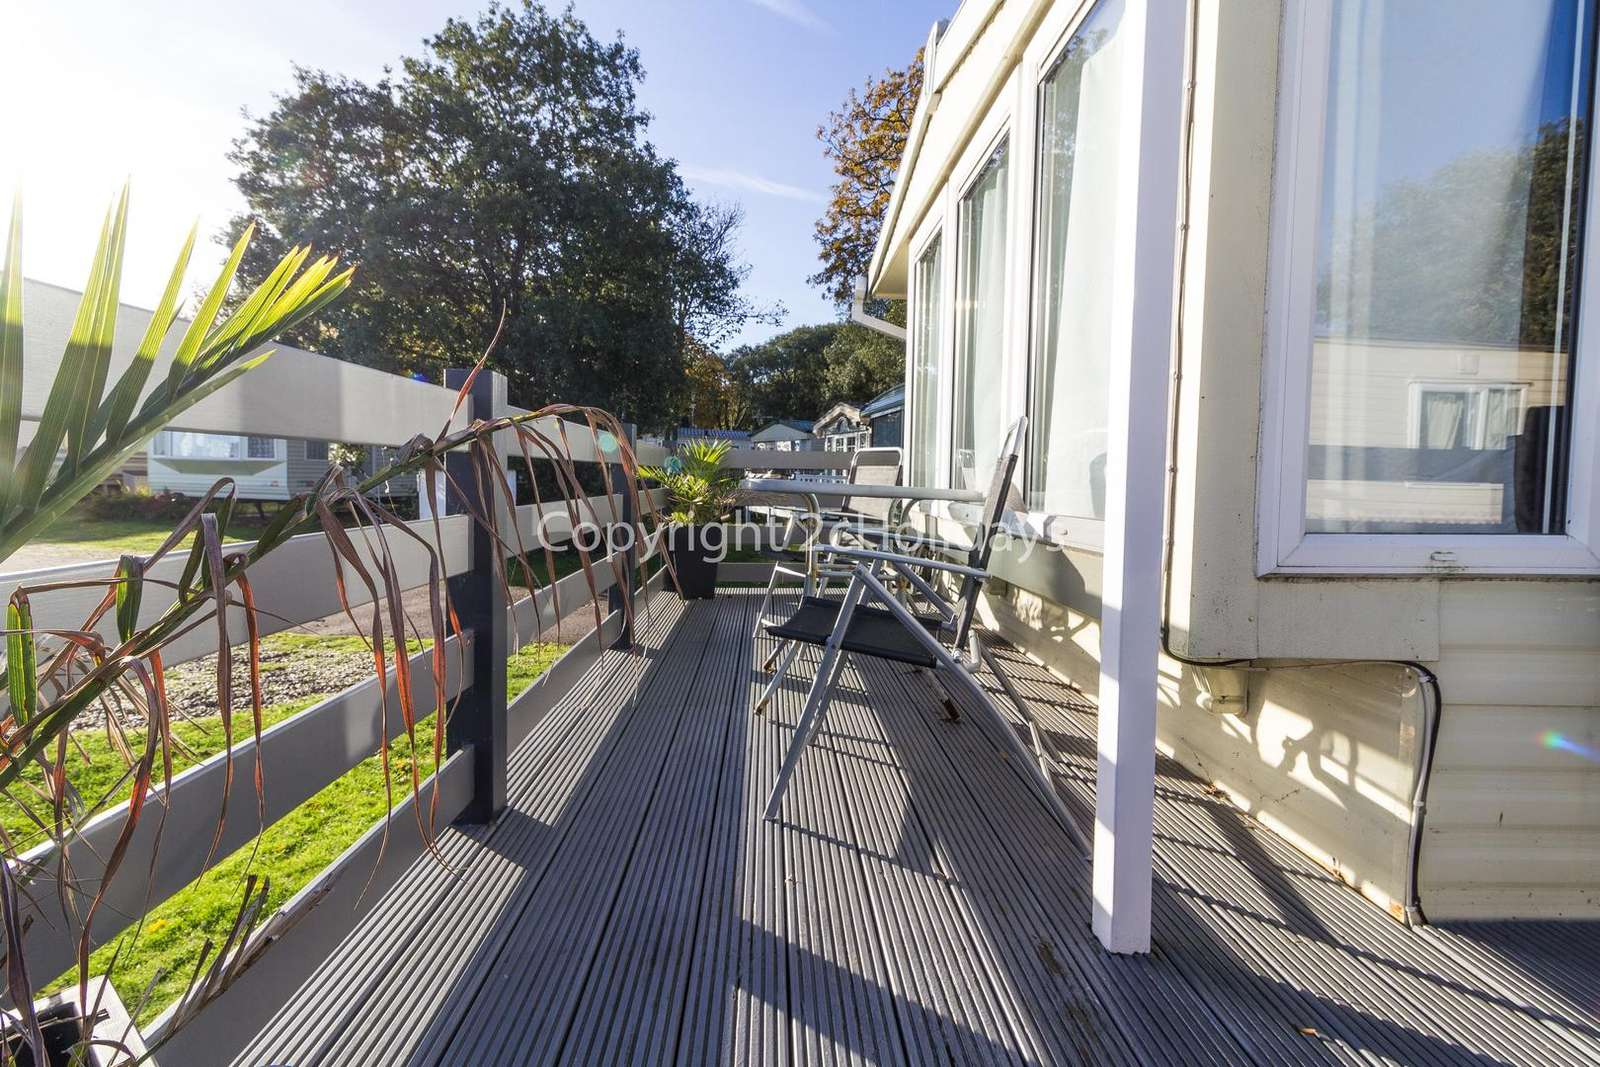 So many families have enjoyed a great break Azure Seas Holiday Village